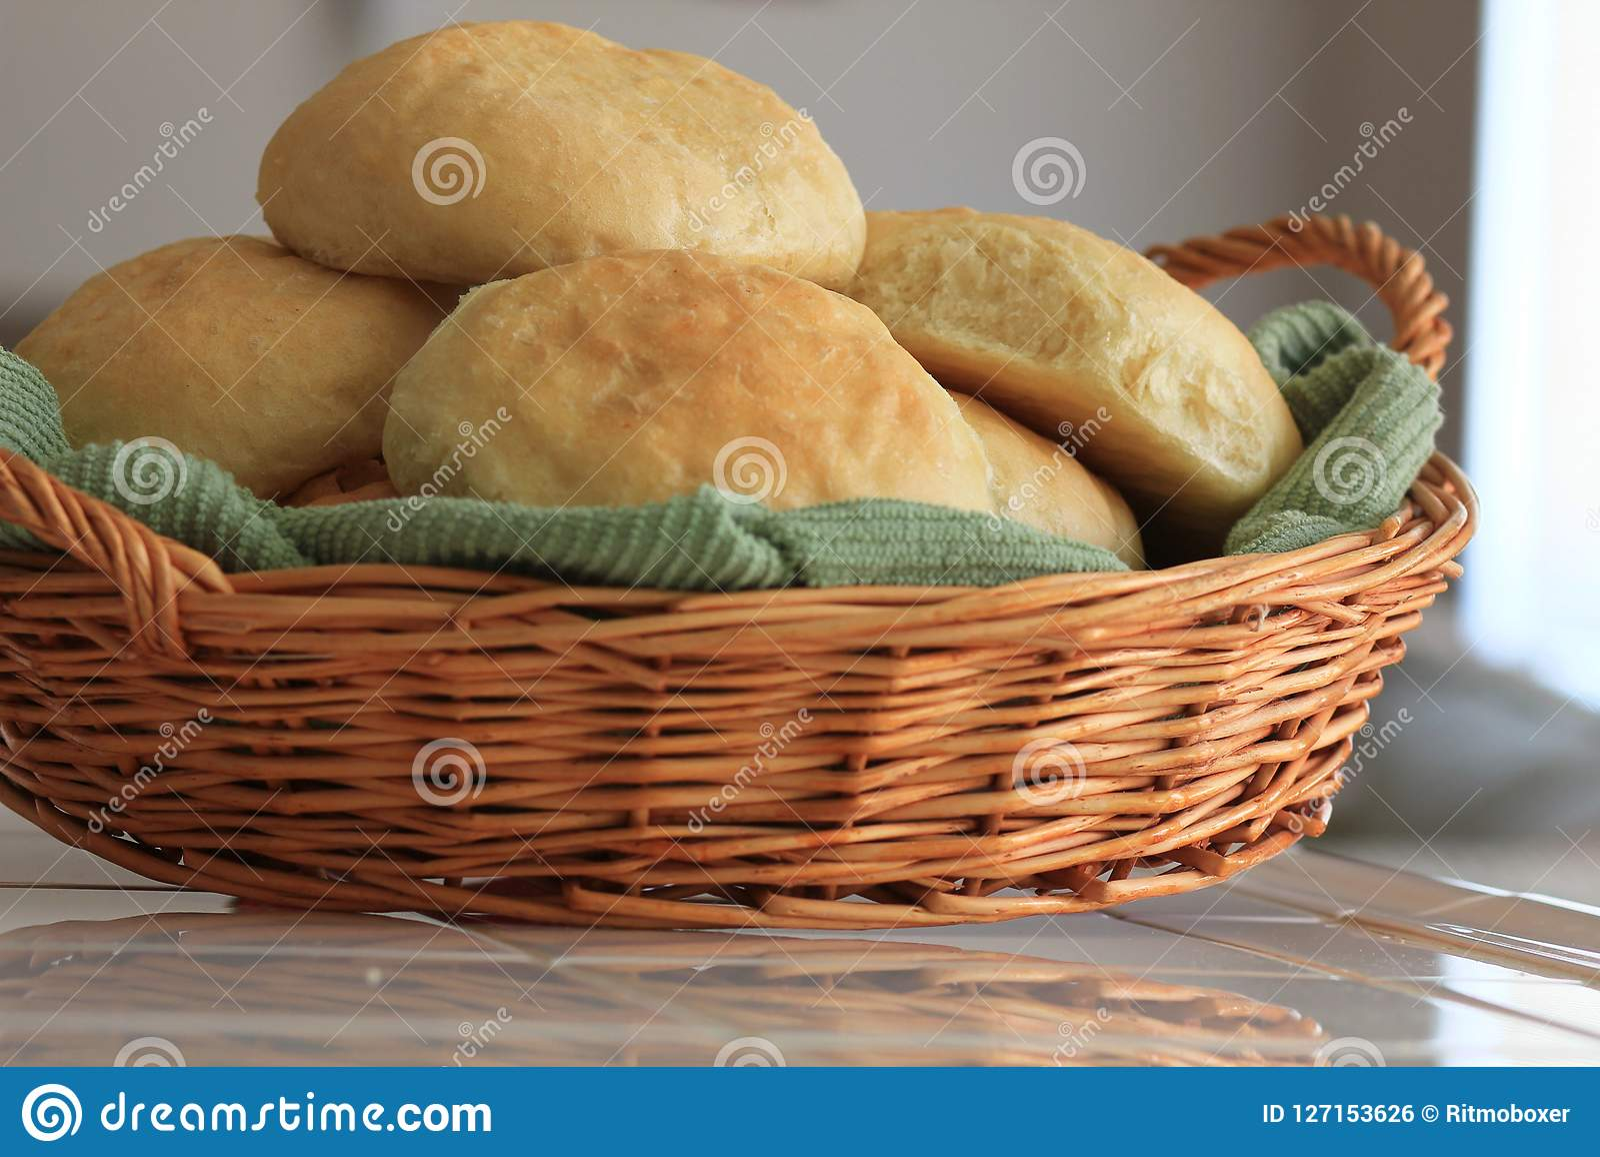 Freshly baked homemade yeast bread rolls resting in a wicker basket.